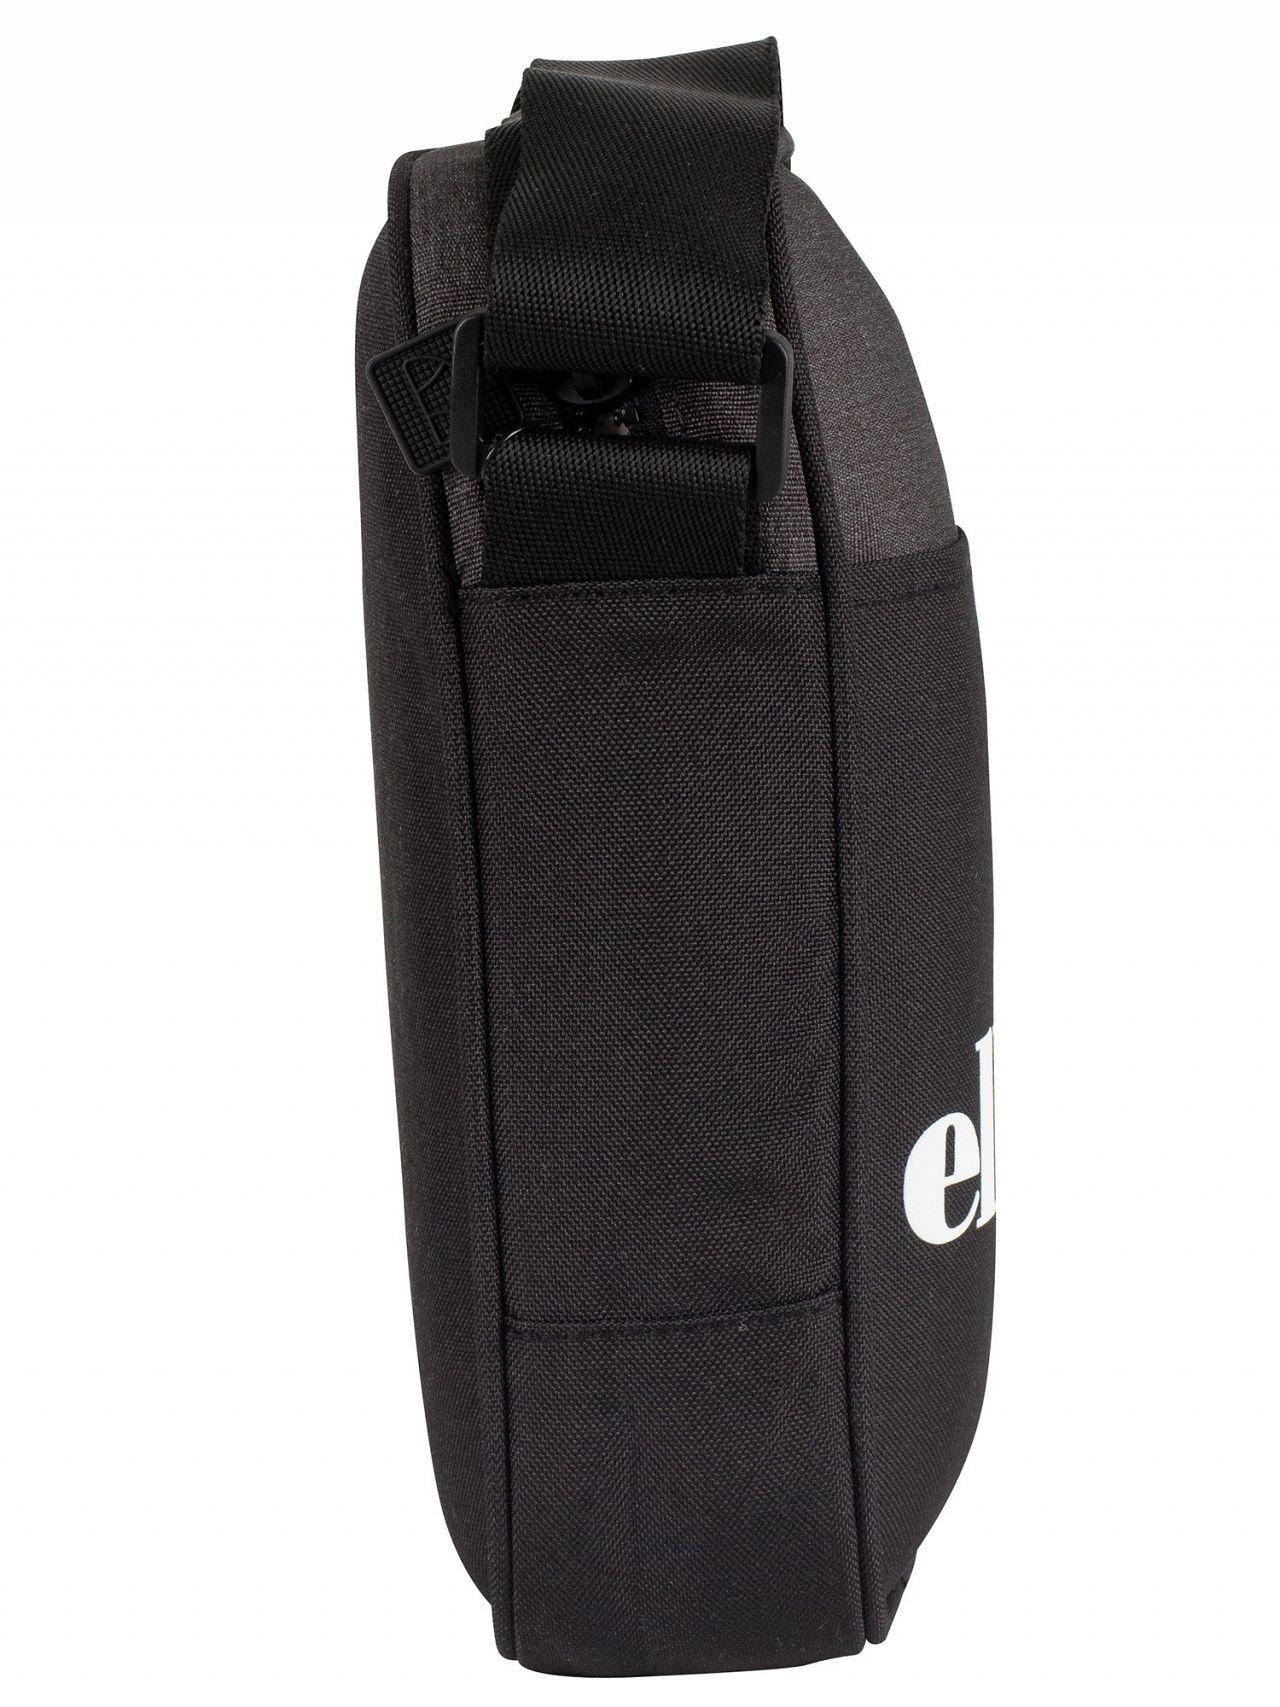 a48f6087d153 Ellesse Black Lukka Cross Body Bag